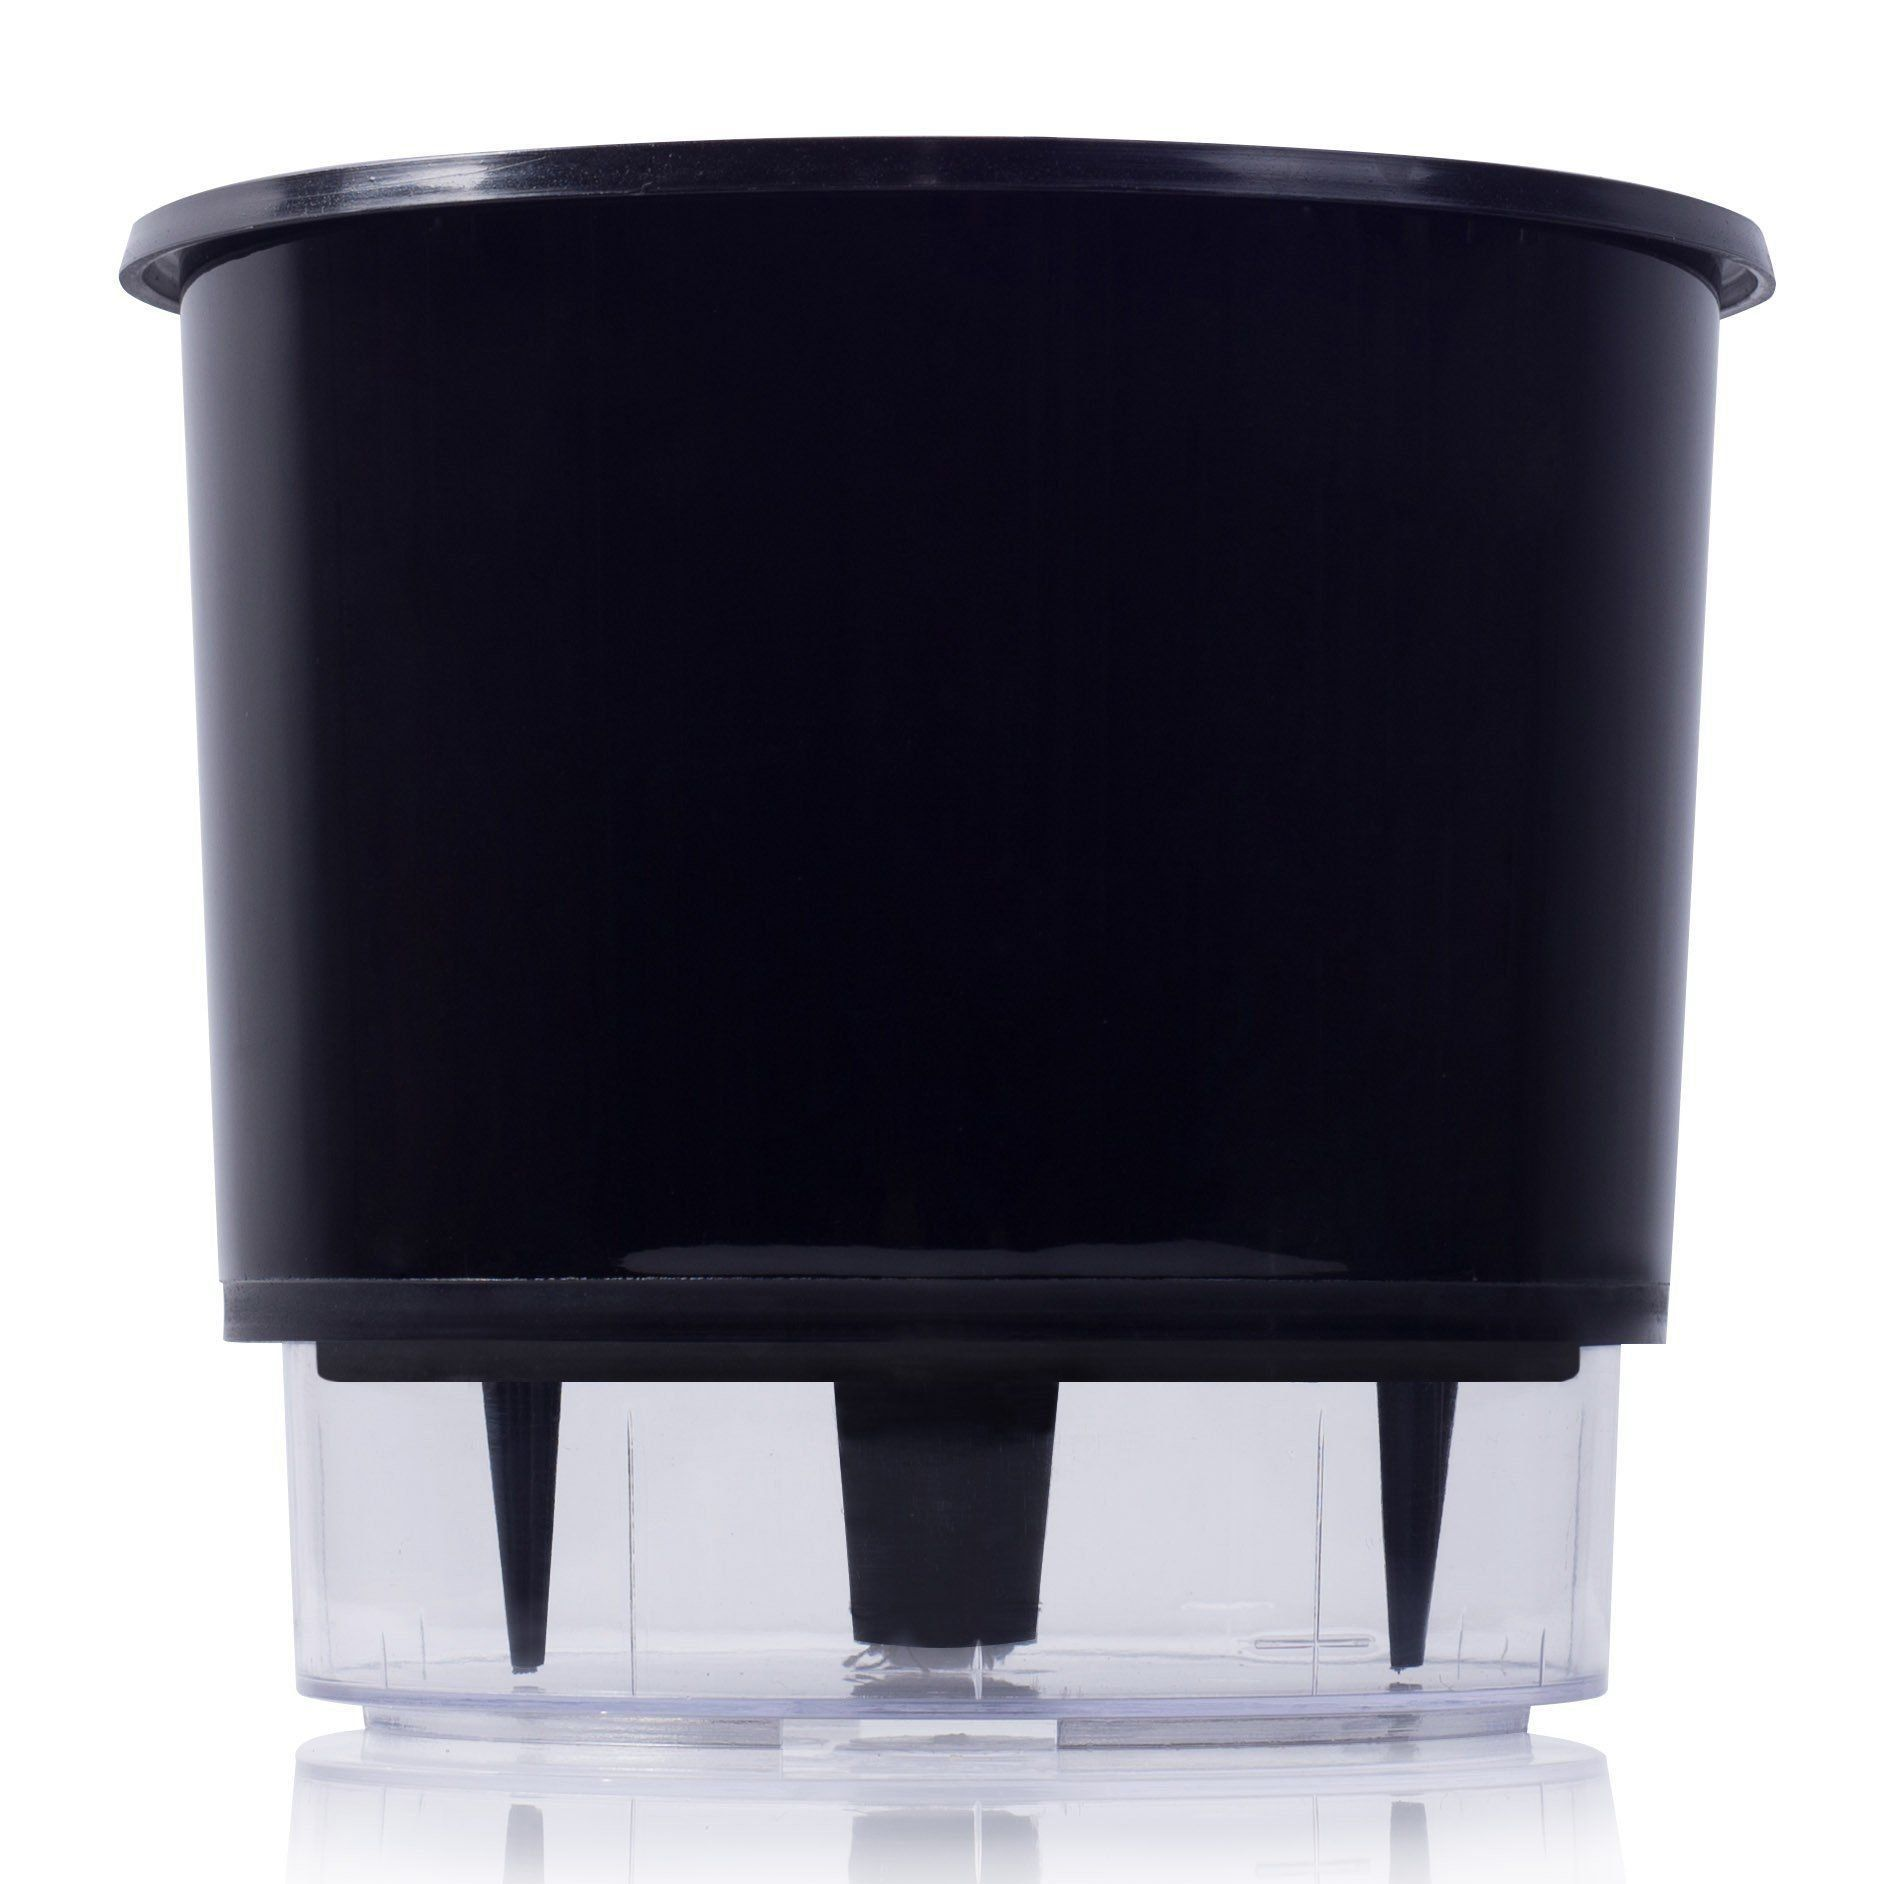 Vaso Autoirrigável Médio 16cm x 14cm Preto